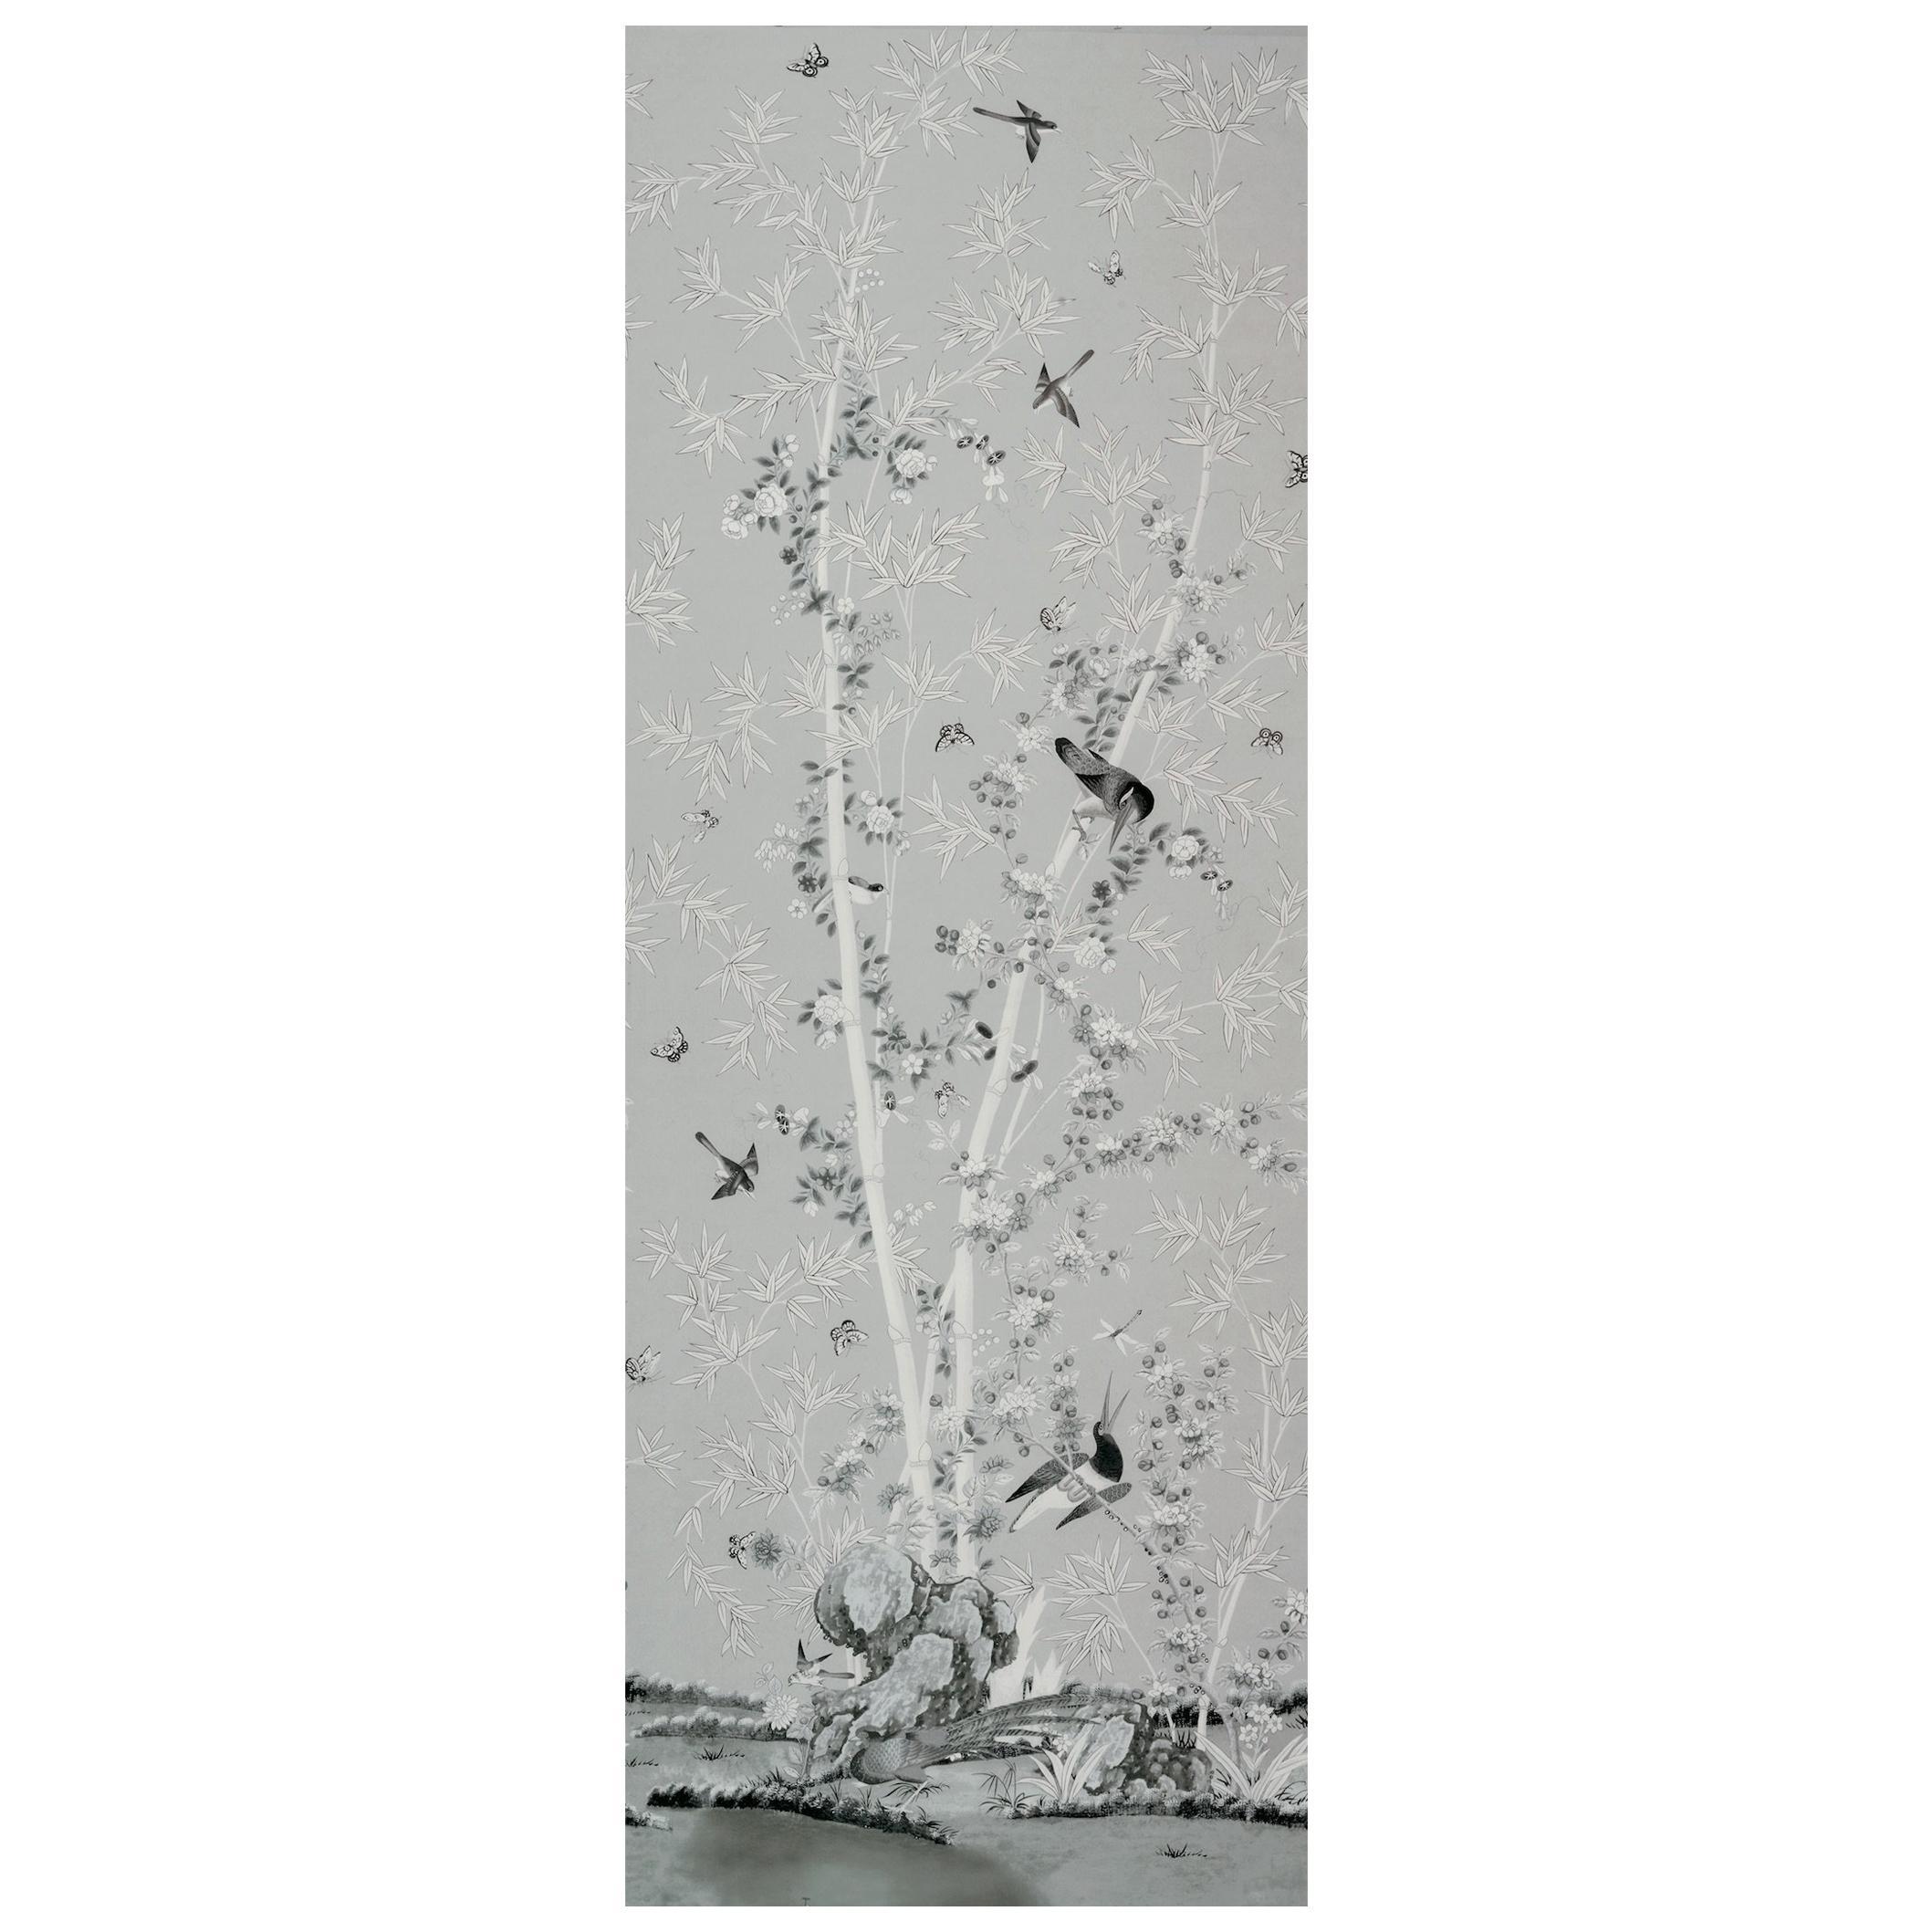 Schumacher Miles Redd Brighton Pavilion Chinoiserie Black White Wallpaper Panel